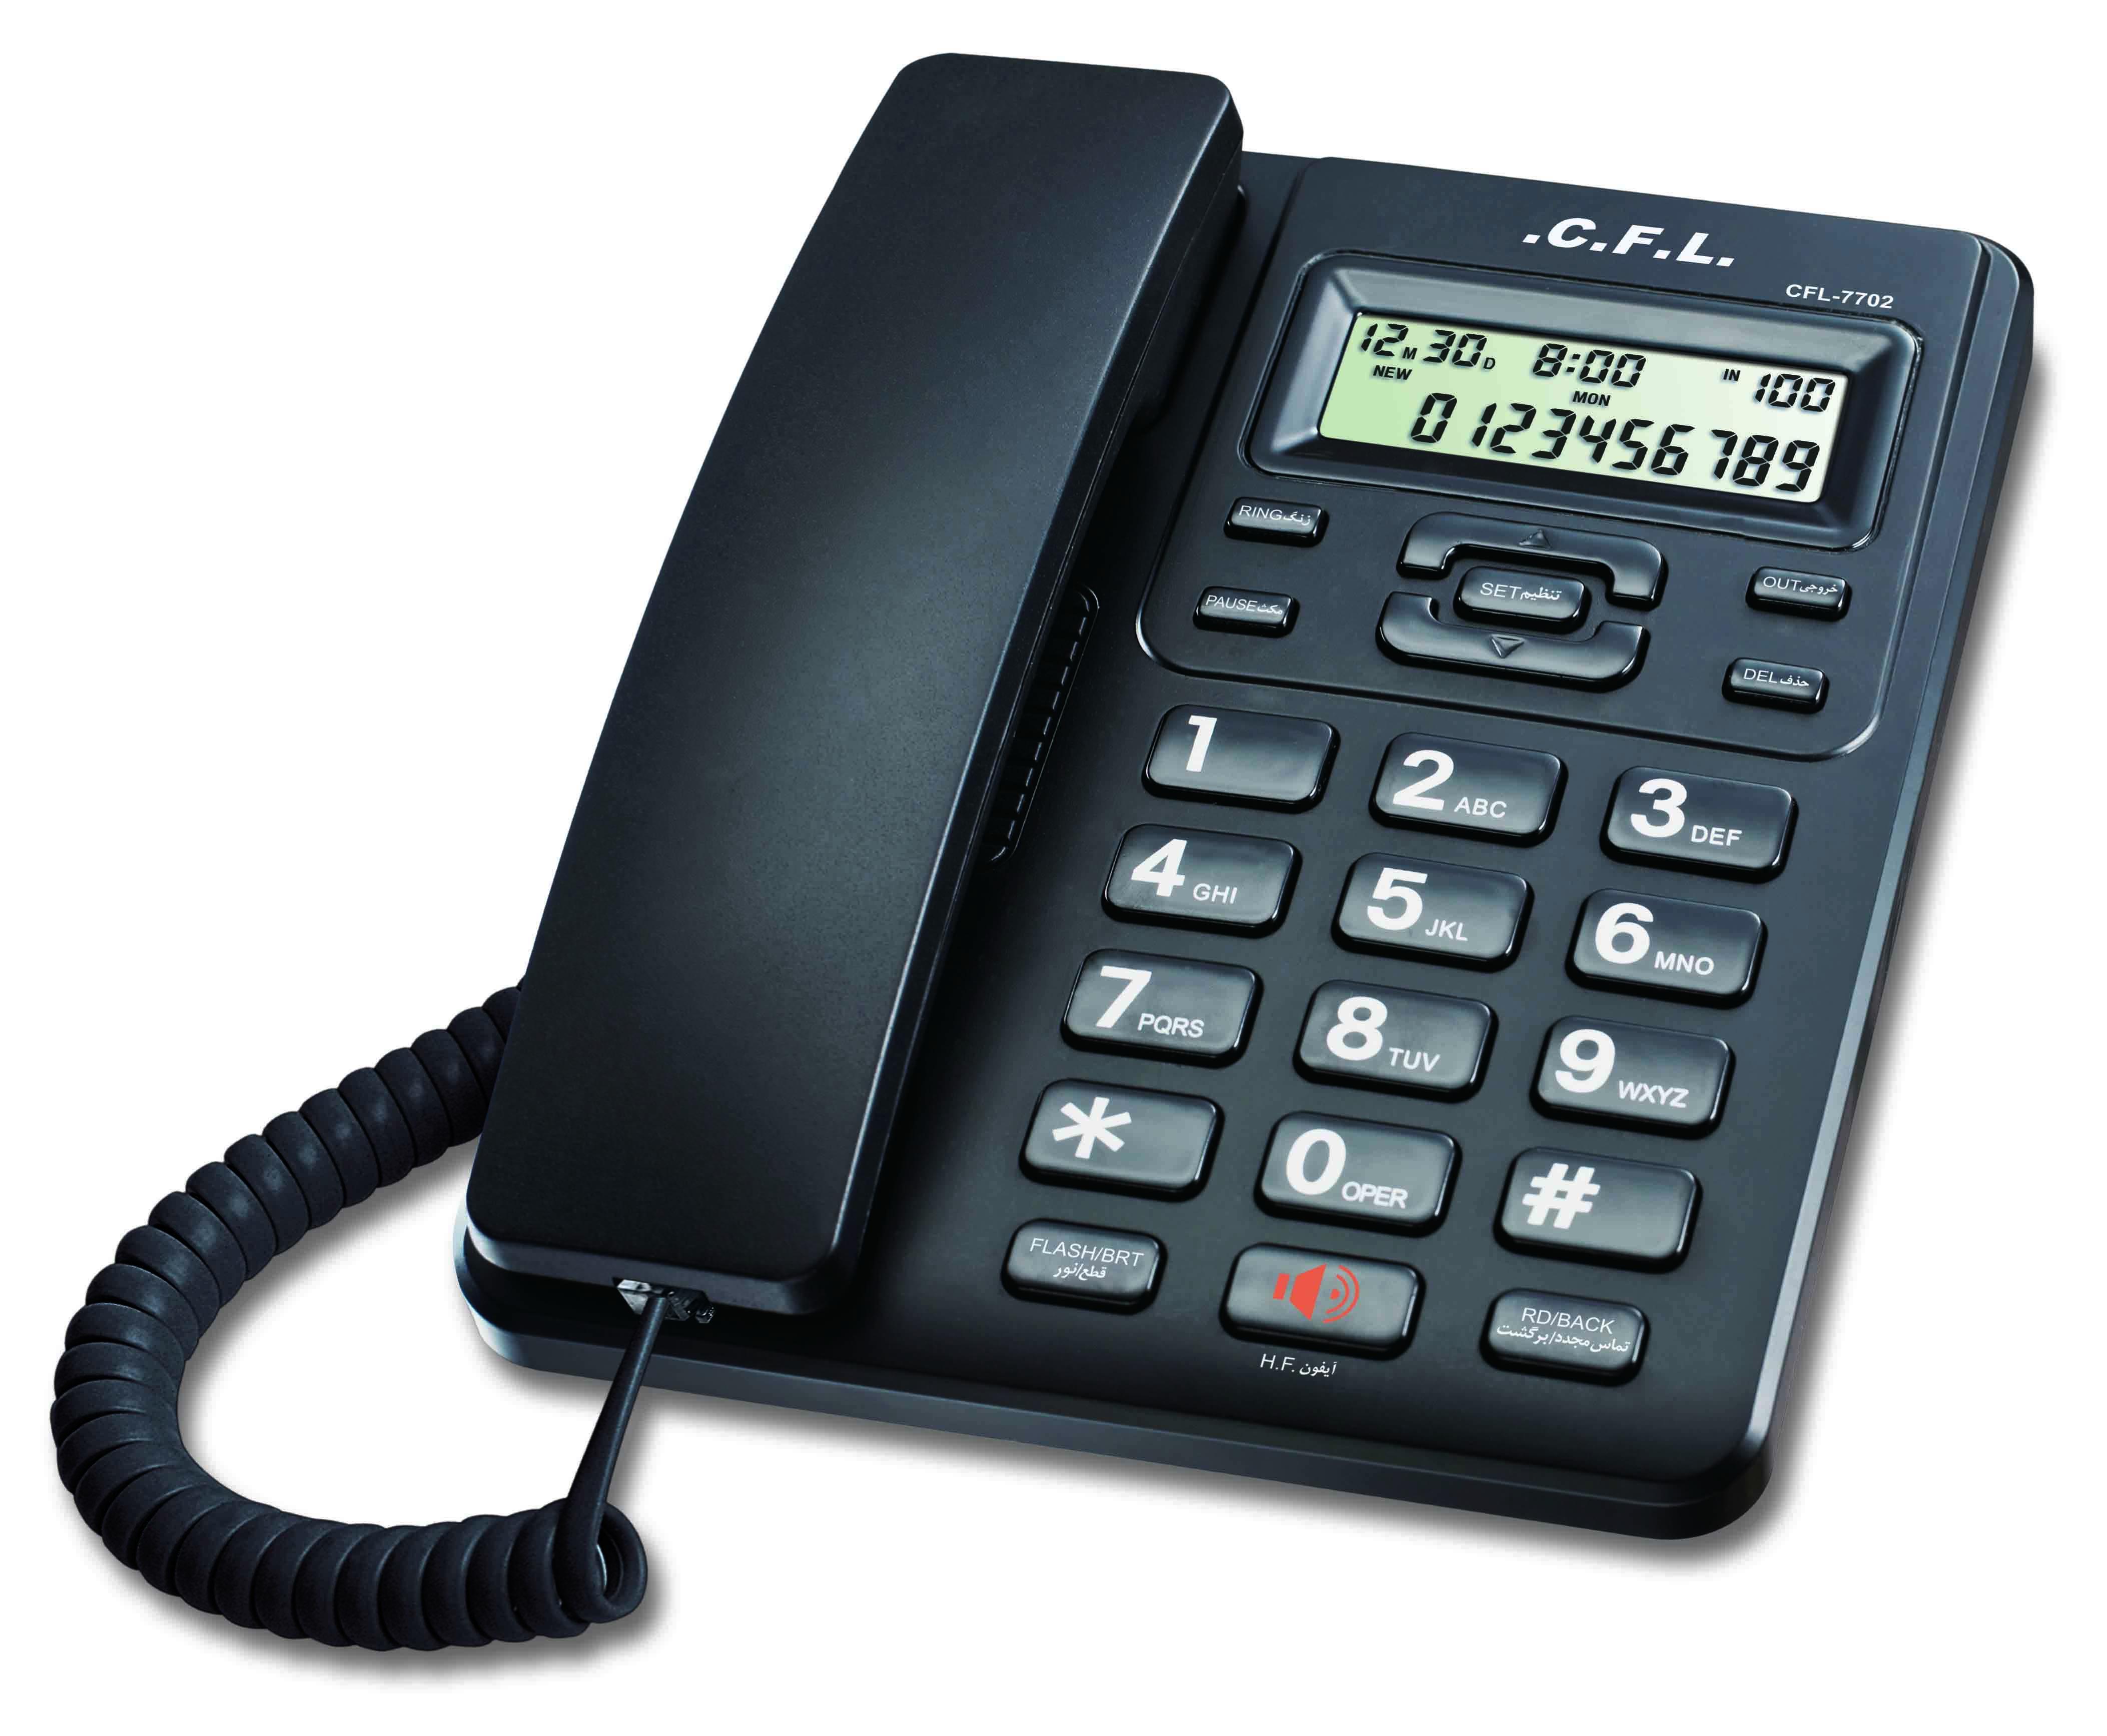 تلفن سی اف ال مدل7702